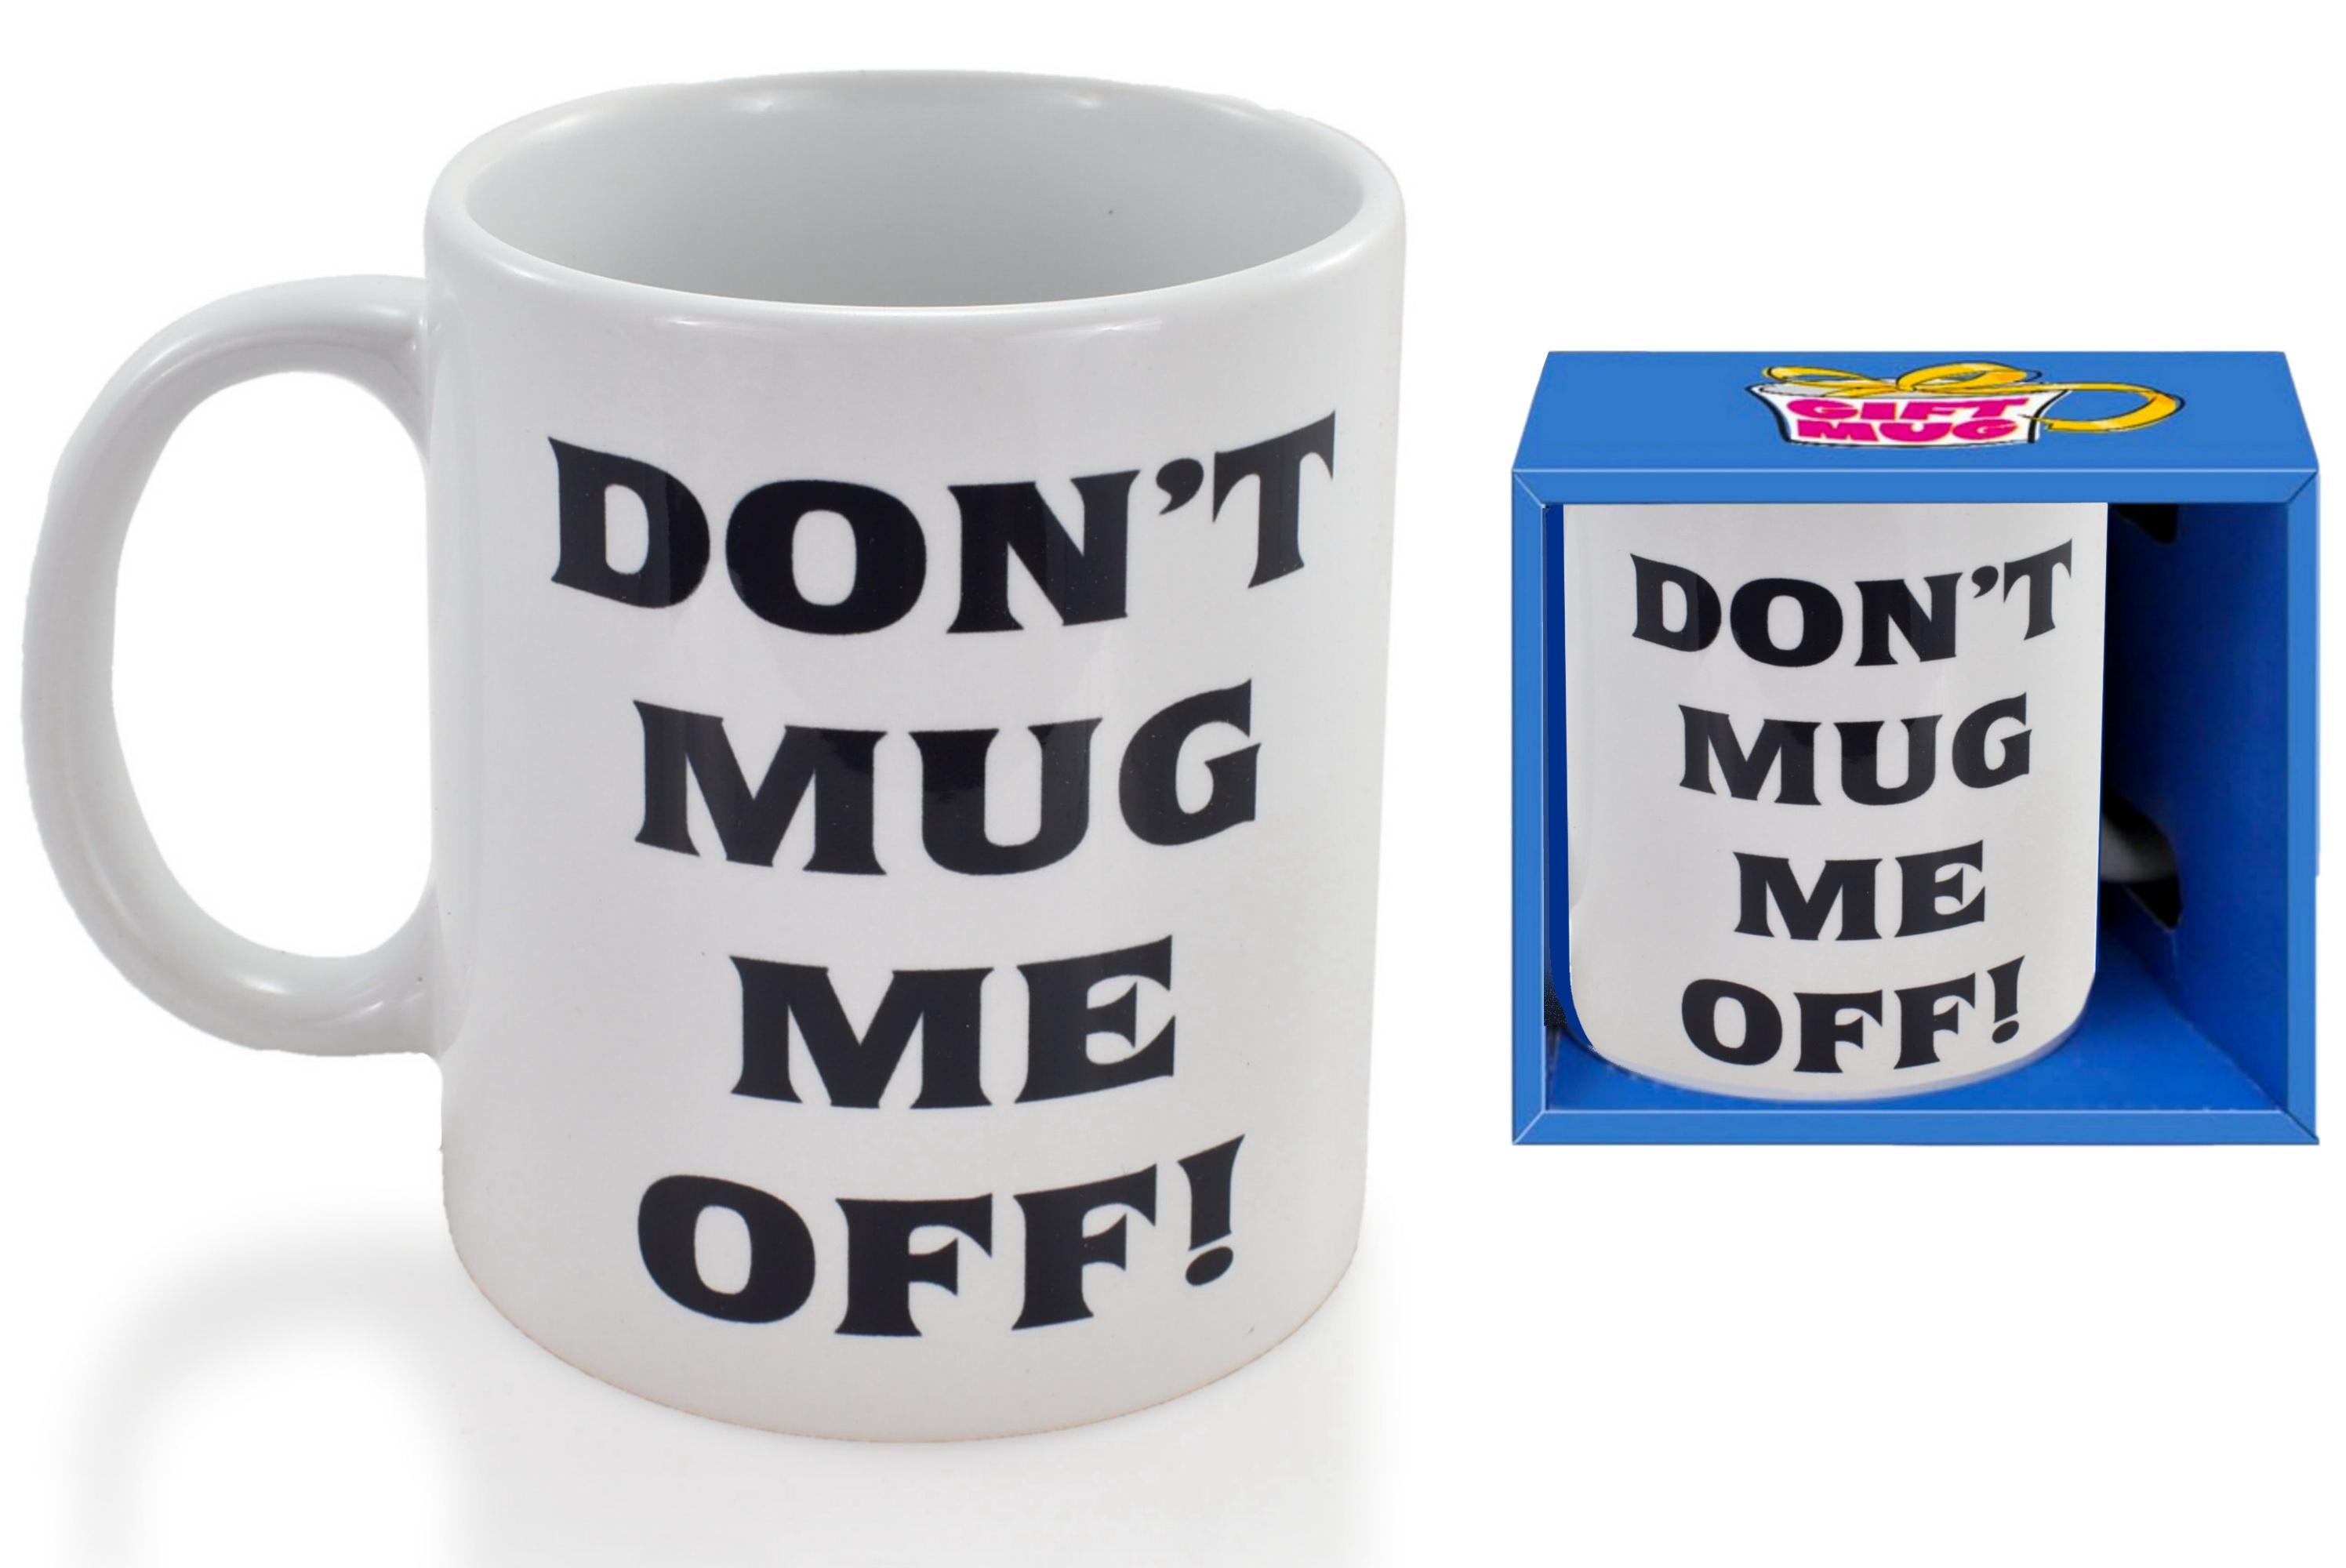 Mug Me Off Mug In Gift Box